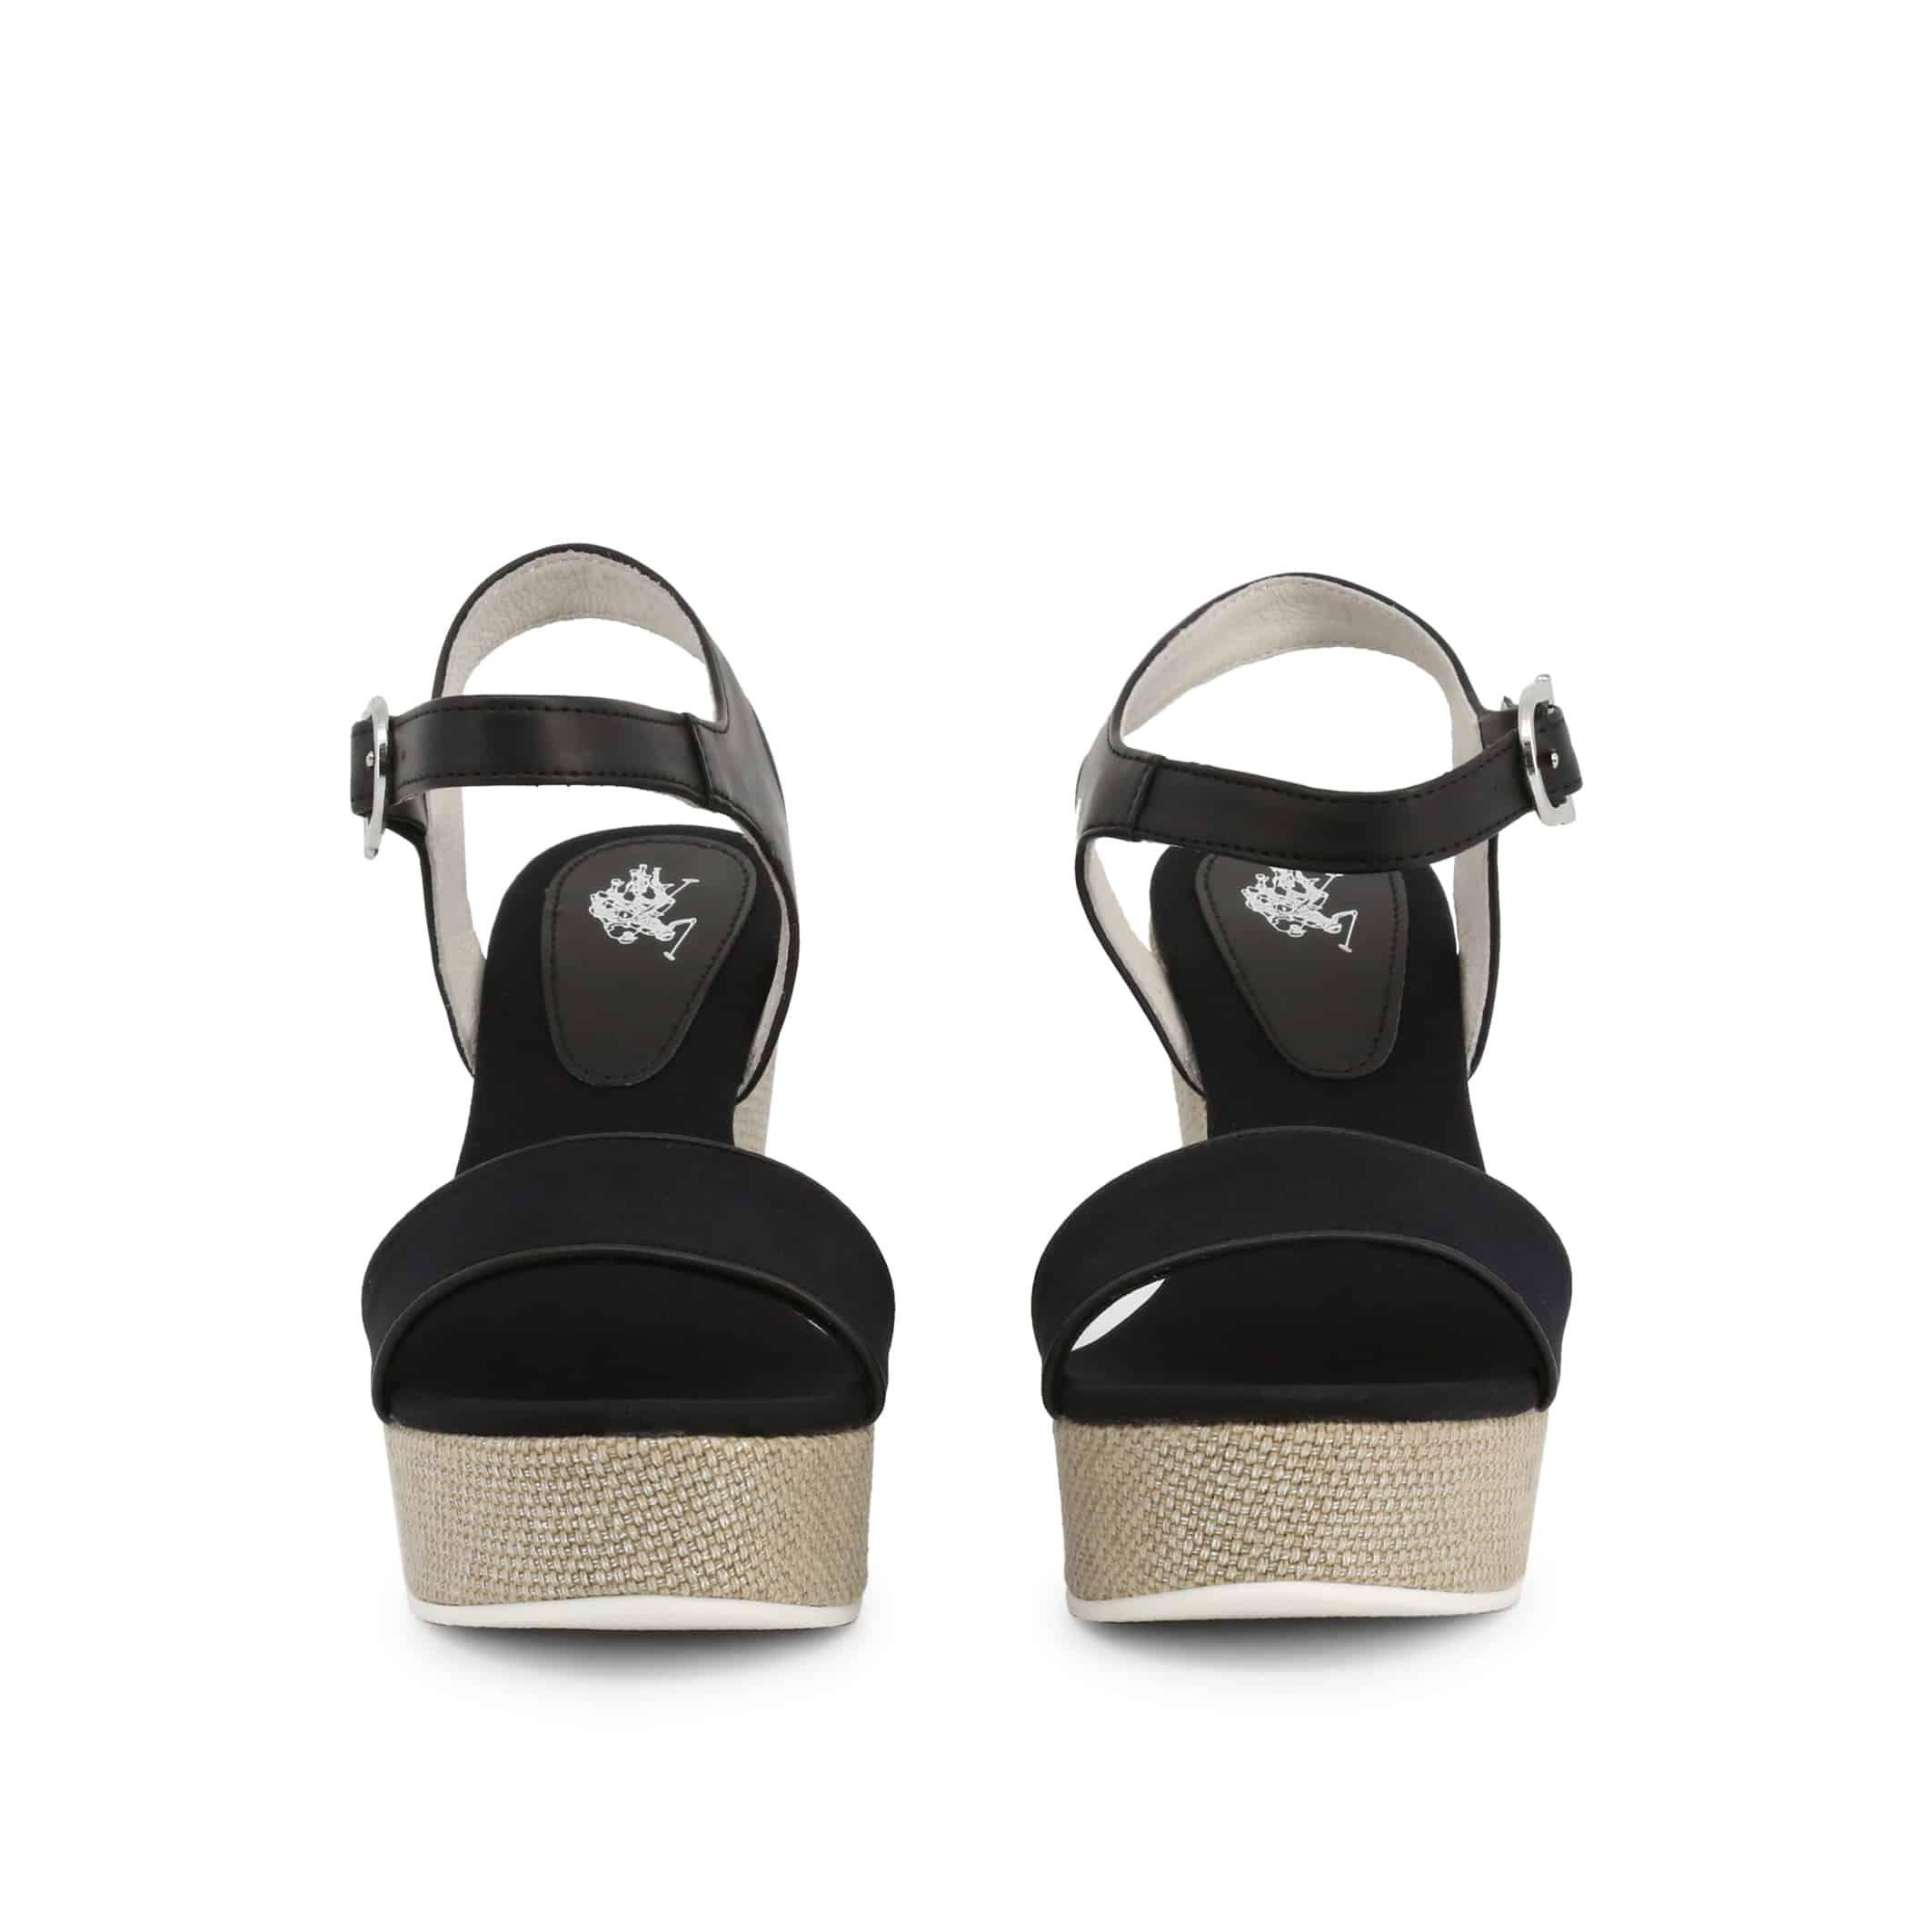 Sandales à plateforme U.S. Polo Assn. – AYLIN4204S0_CY1